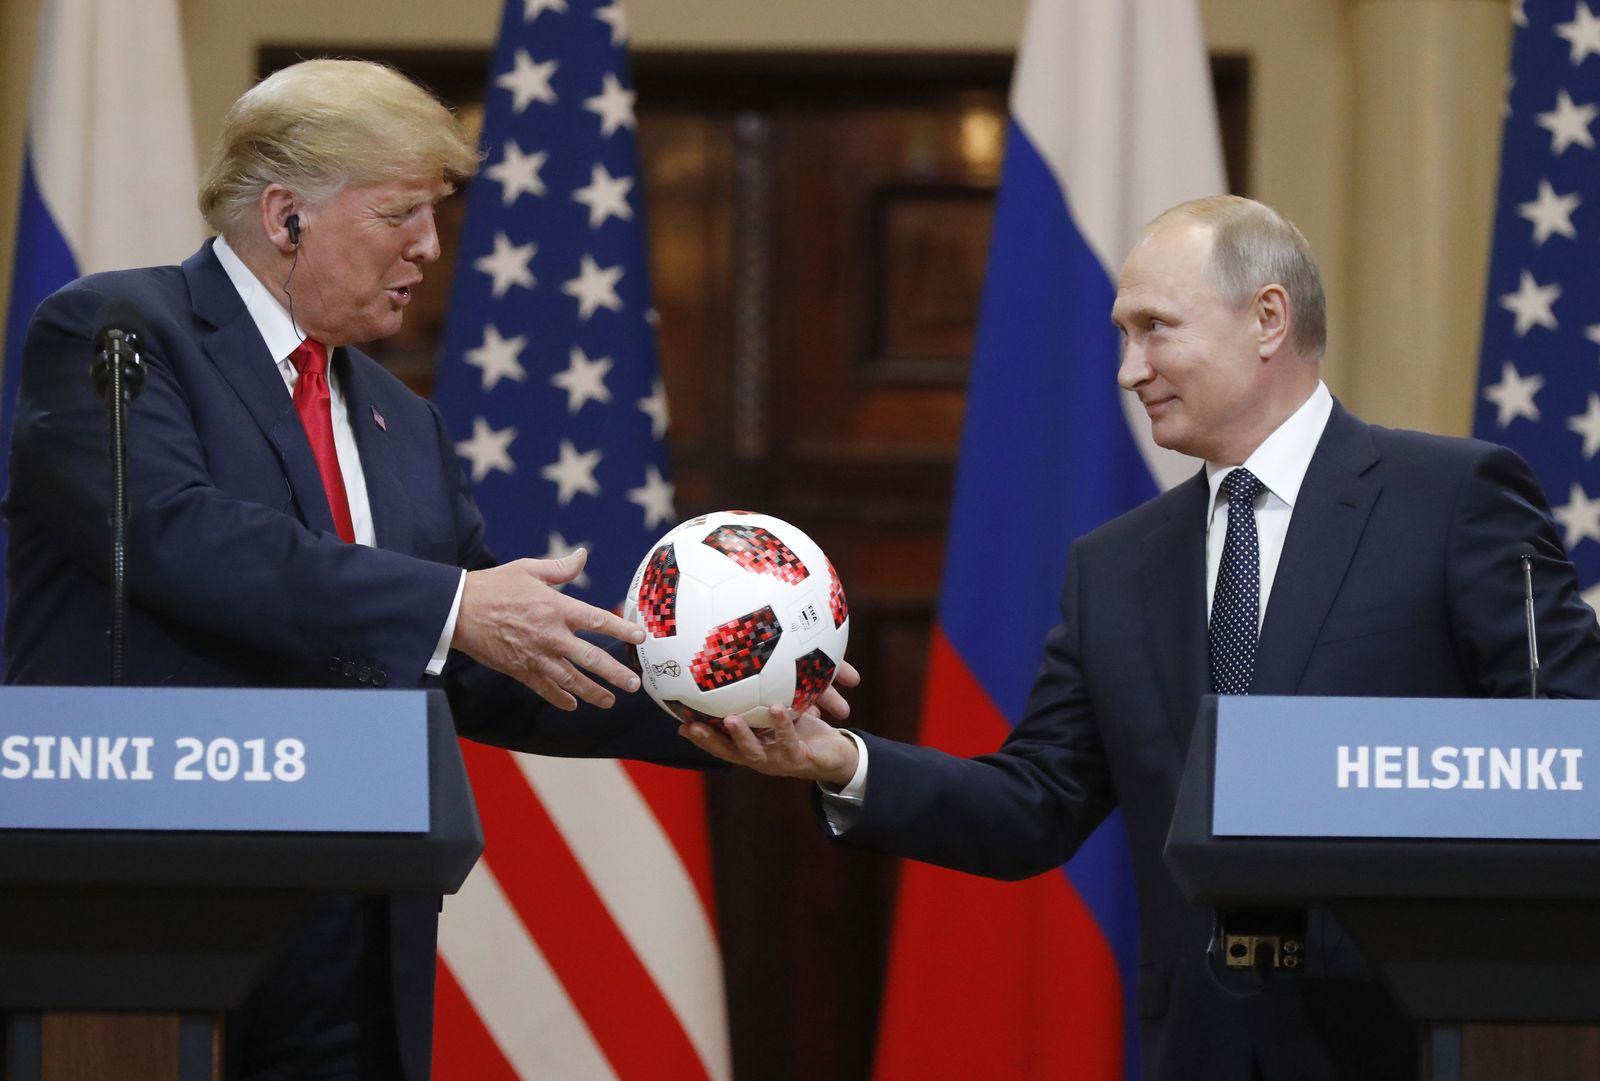 Donald Trump und Wladimir Putin / Helsinki